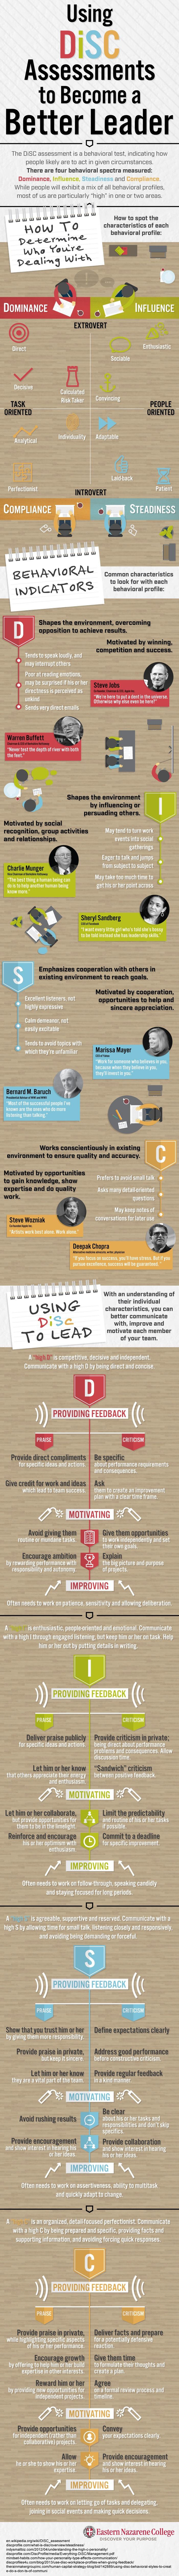 DiSC-become-better-leader--11-24.jpg